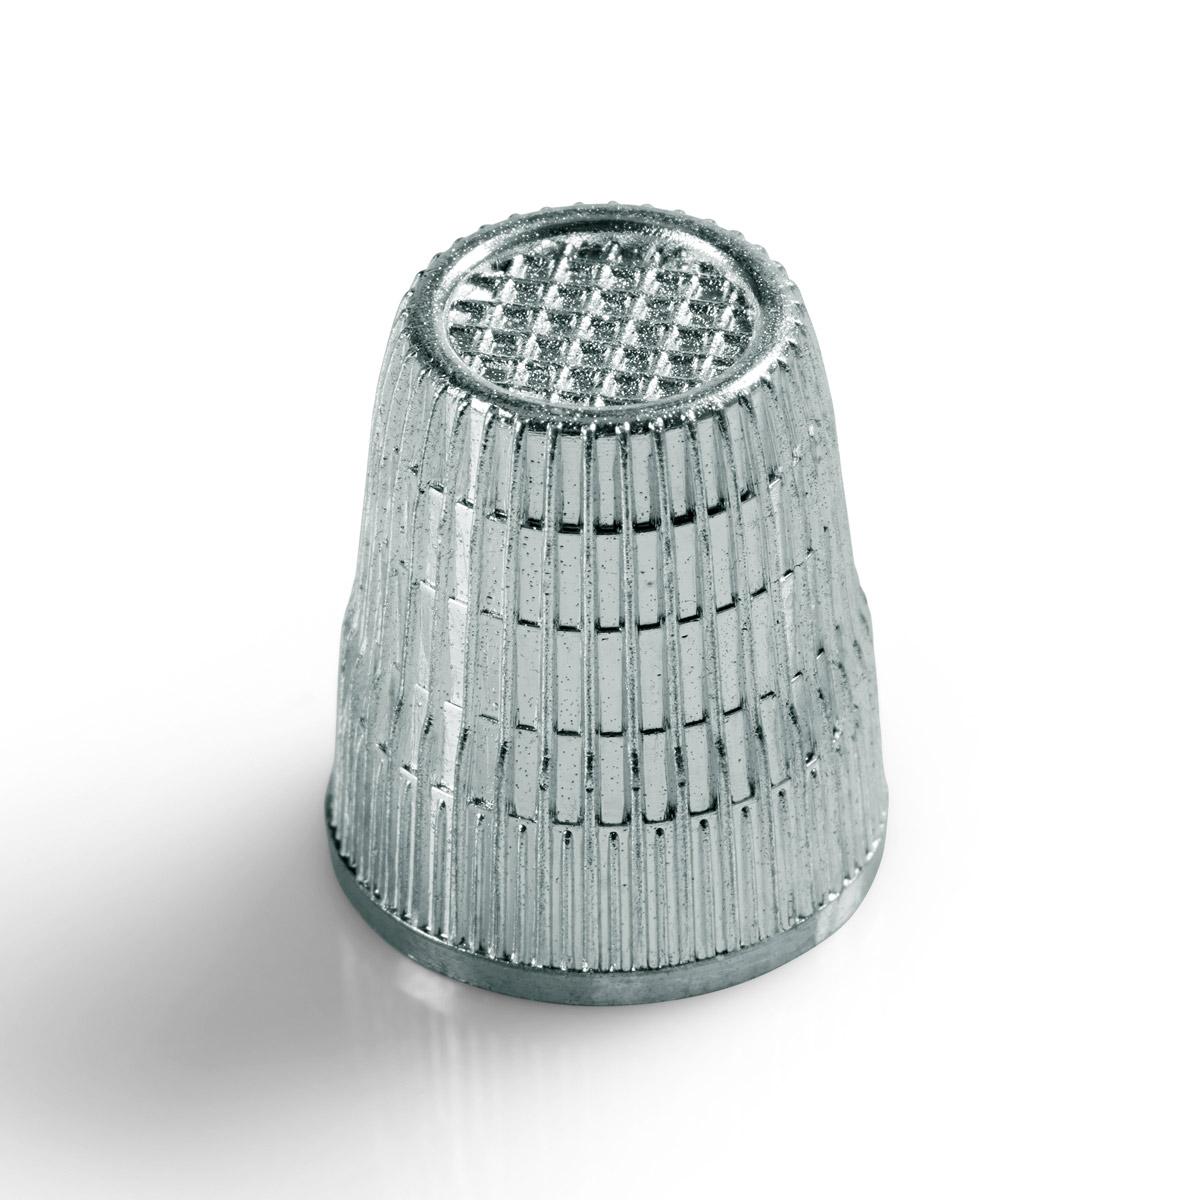 431846 Наперсток, цинк, хромовое покр., серебристый цв. 14 мм Prym